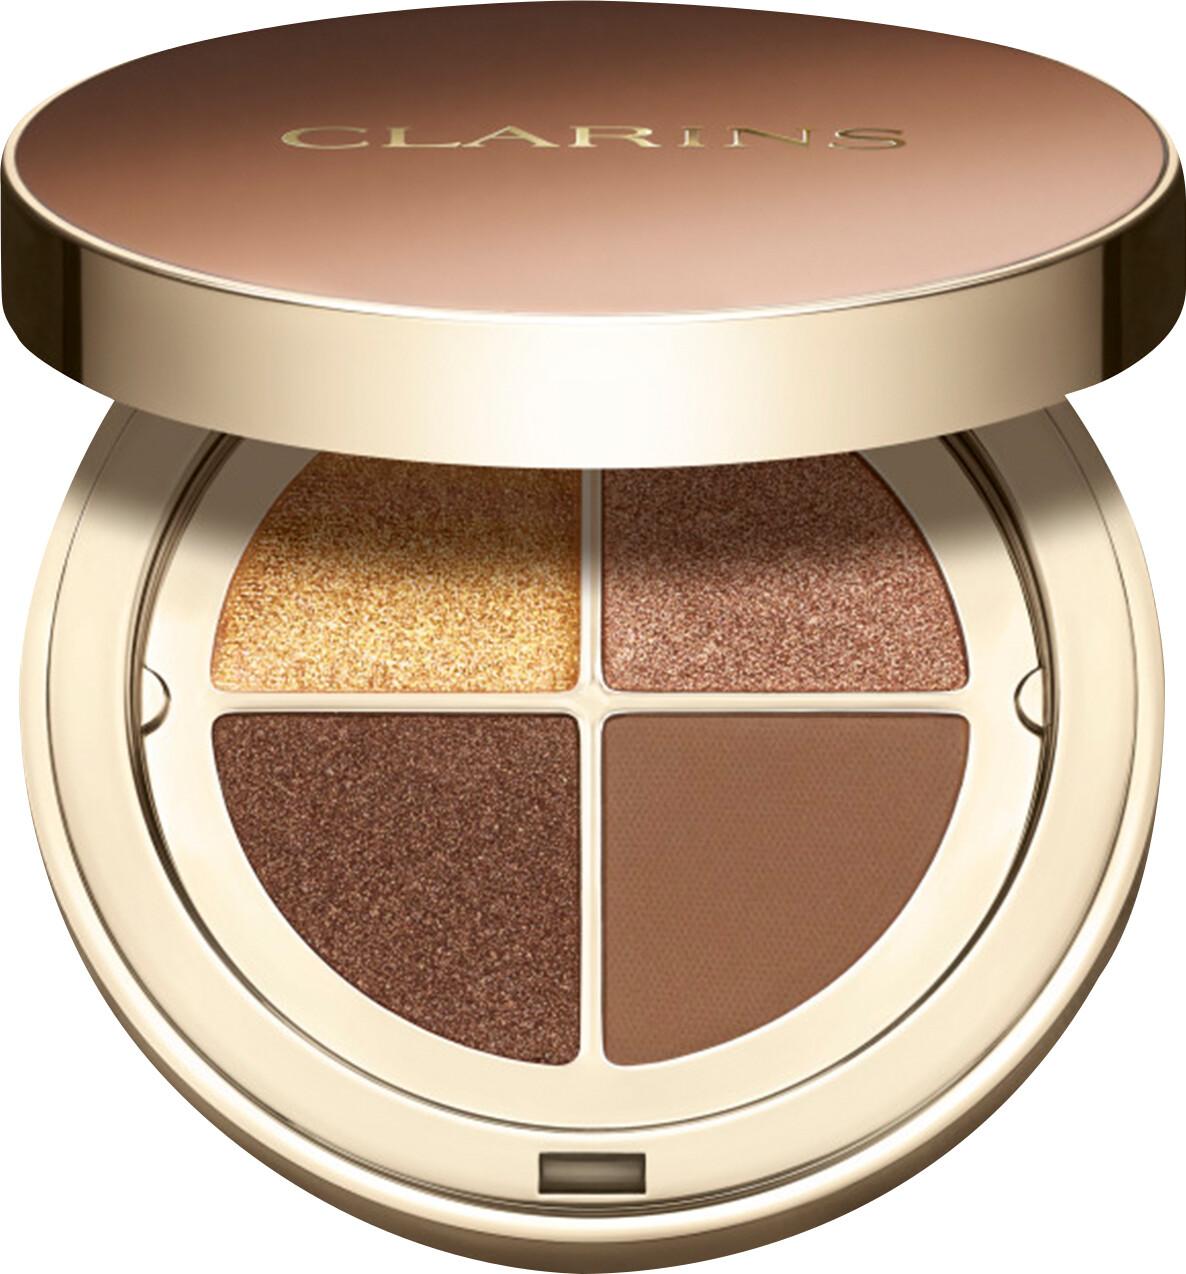 Clarins Ombre 4-Colour Eyeshadow Palette | DOUGLAS